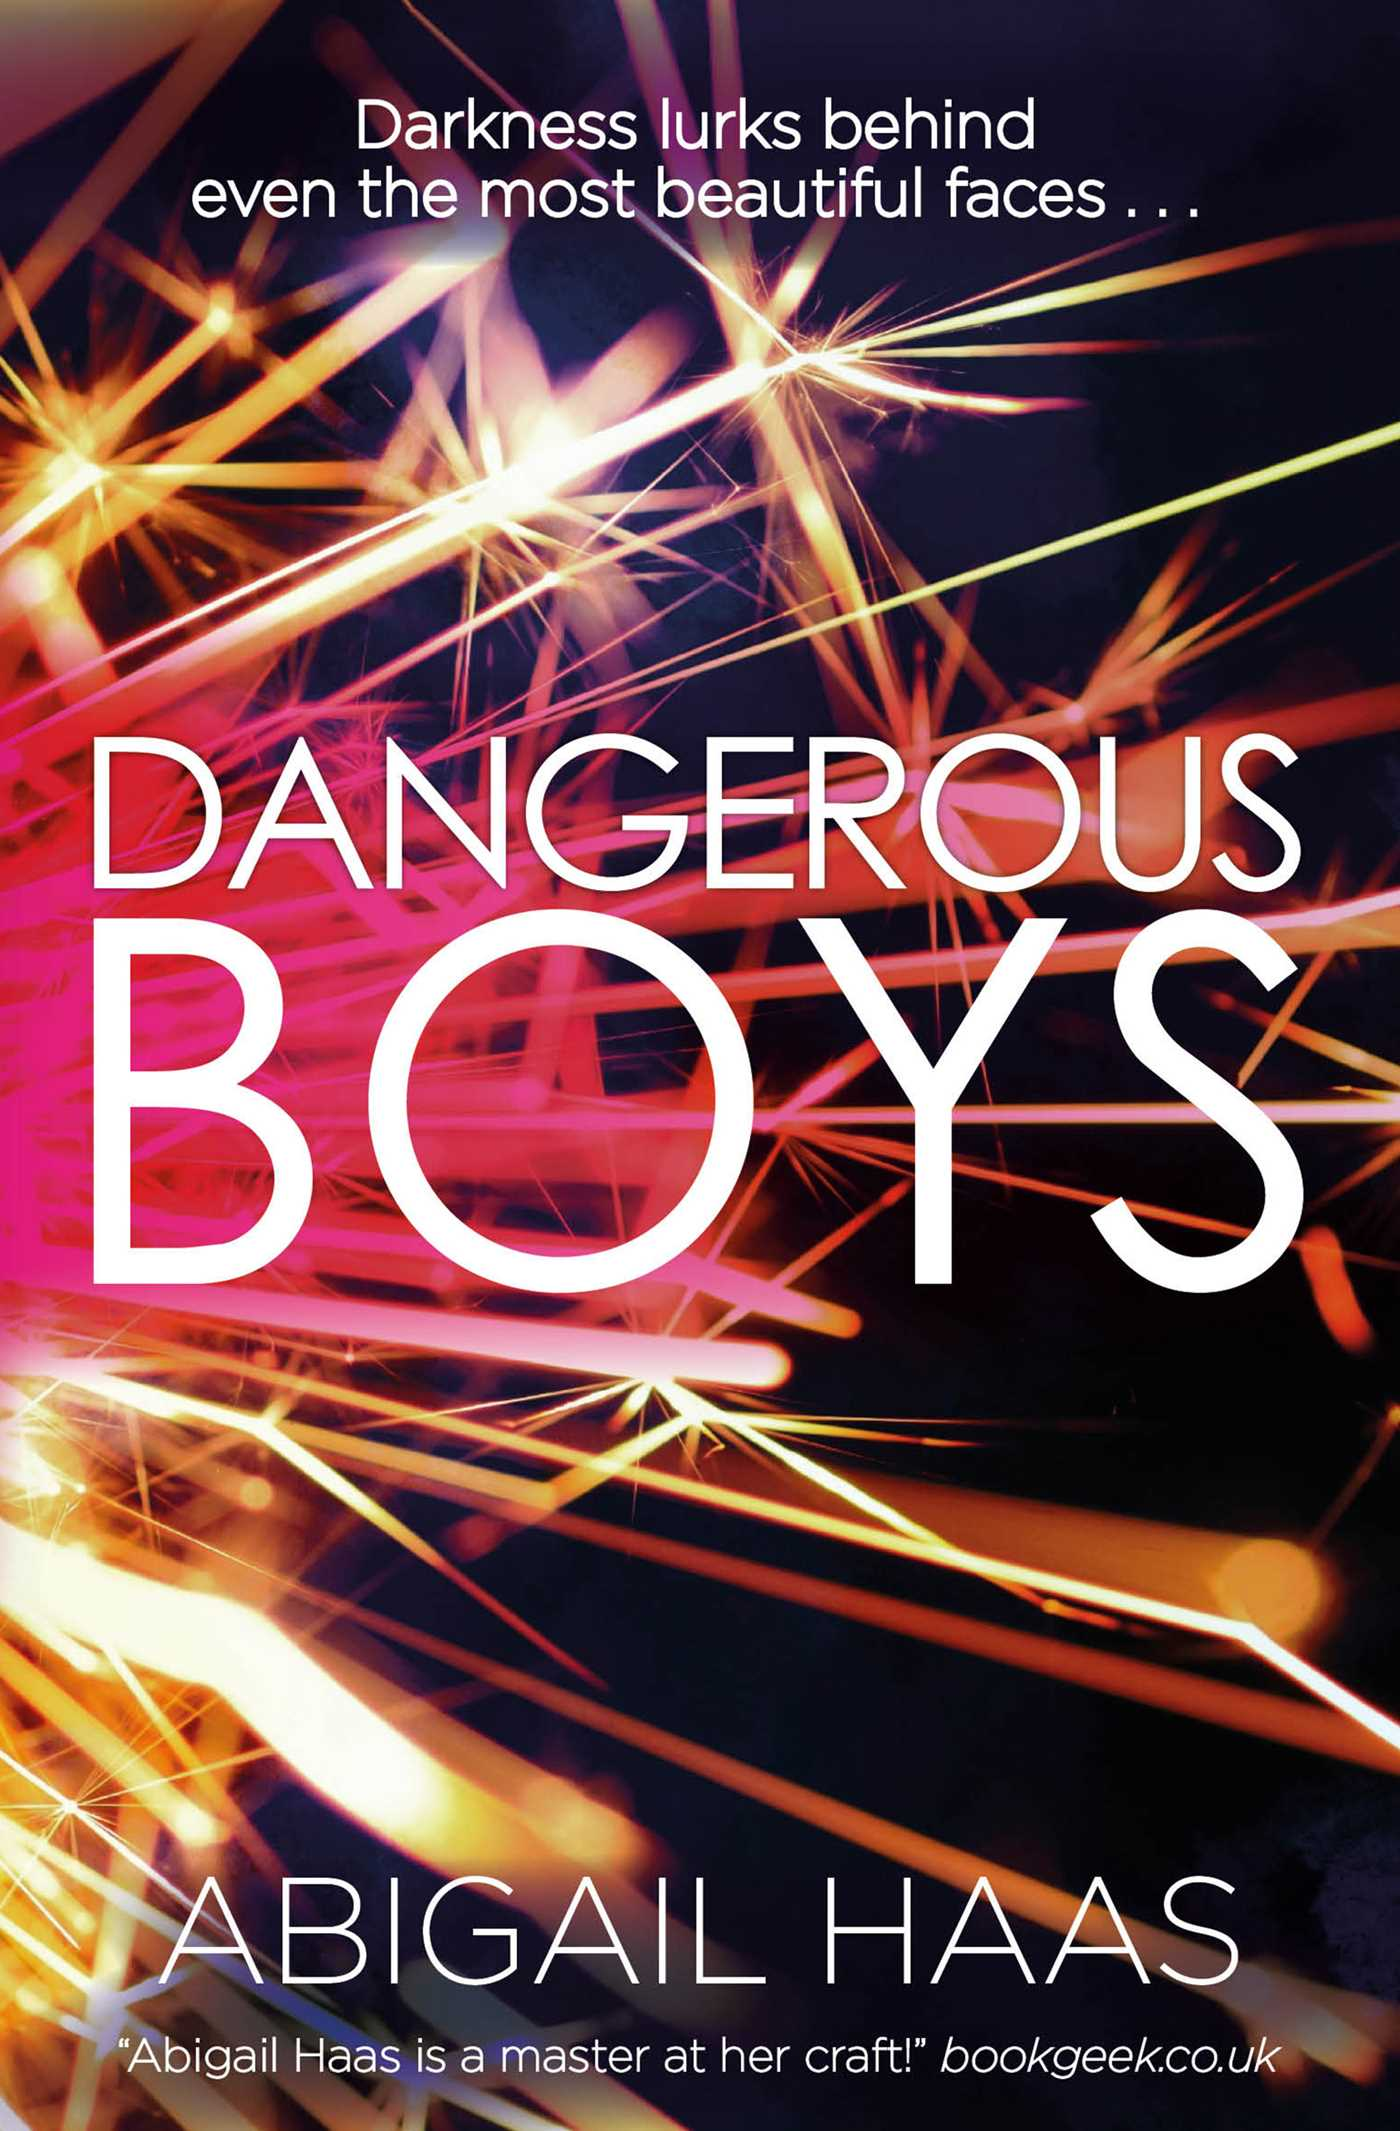 Dangerous Boys by Abigail Haas  Review  |  Amazon  |  Goodreads